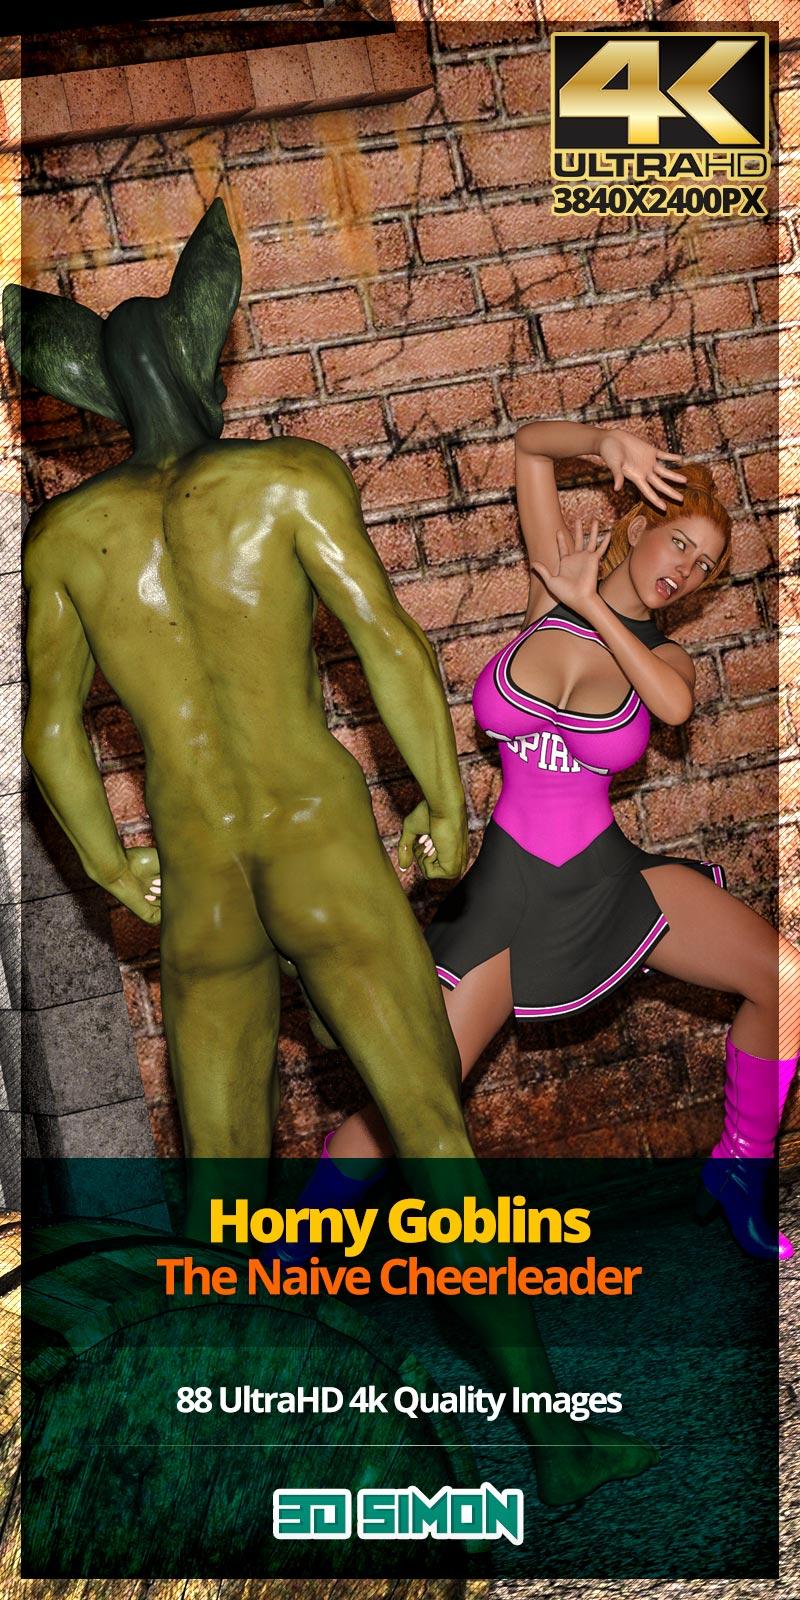 Horny Goblins 1-Naive Cheerleader, 3DSimon image 1